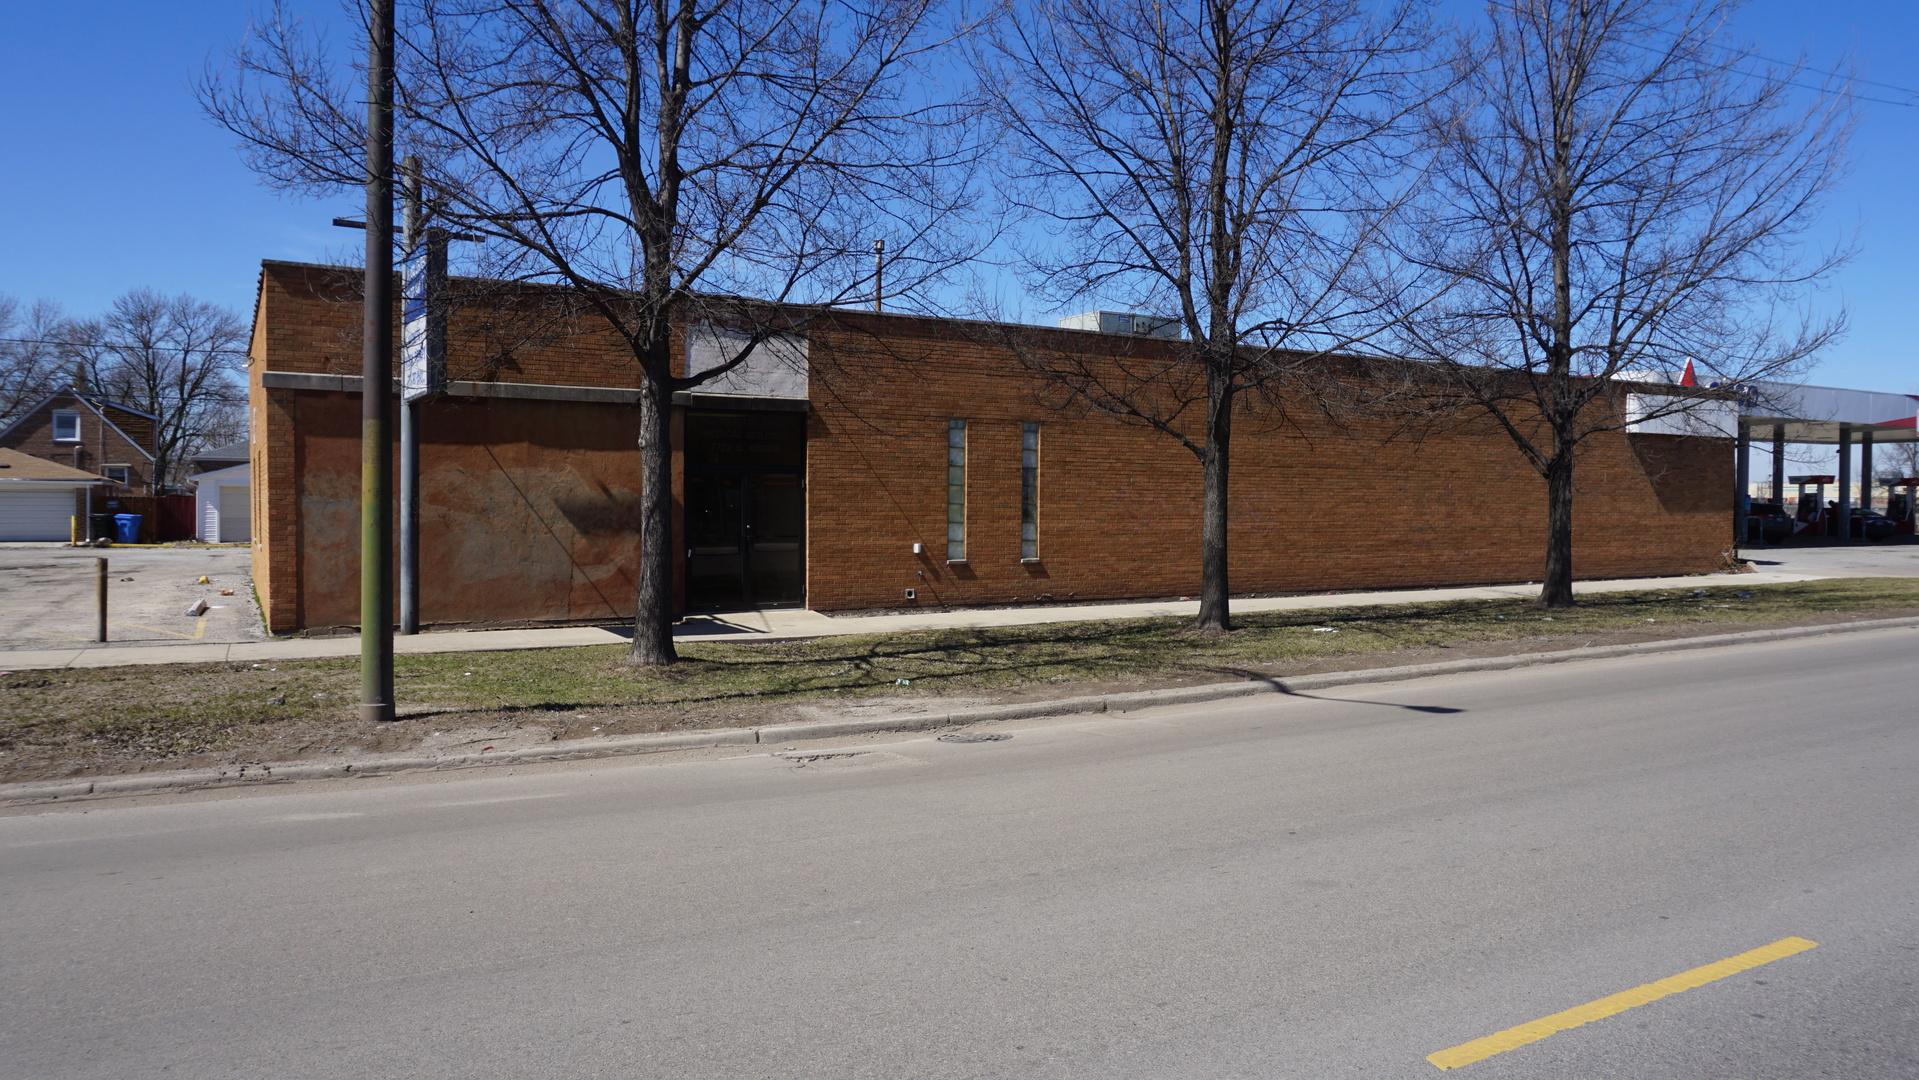 7722 Kedzie ,Chicago, Illinois 60652